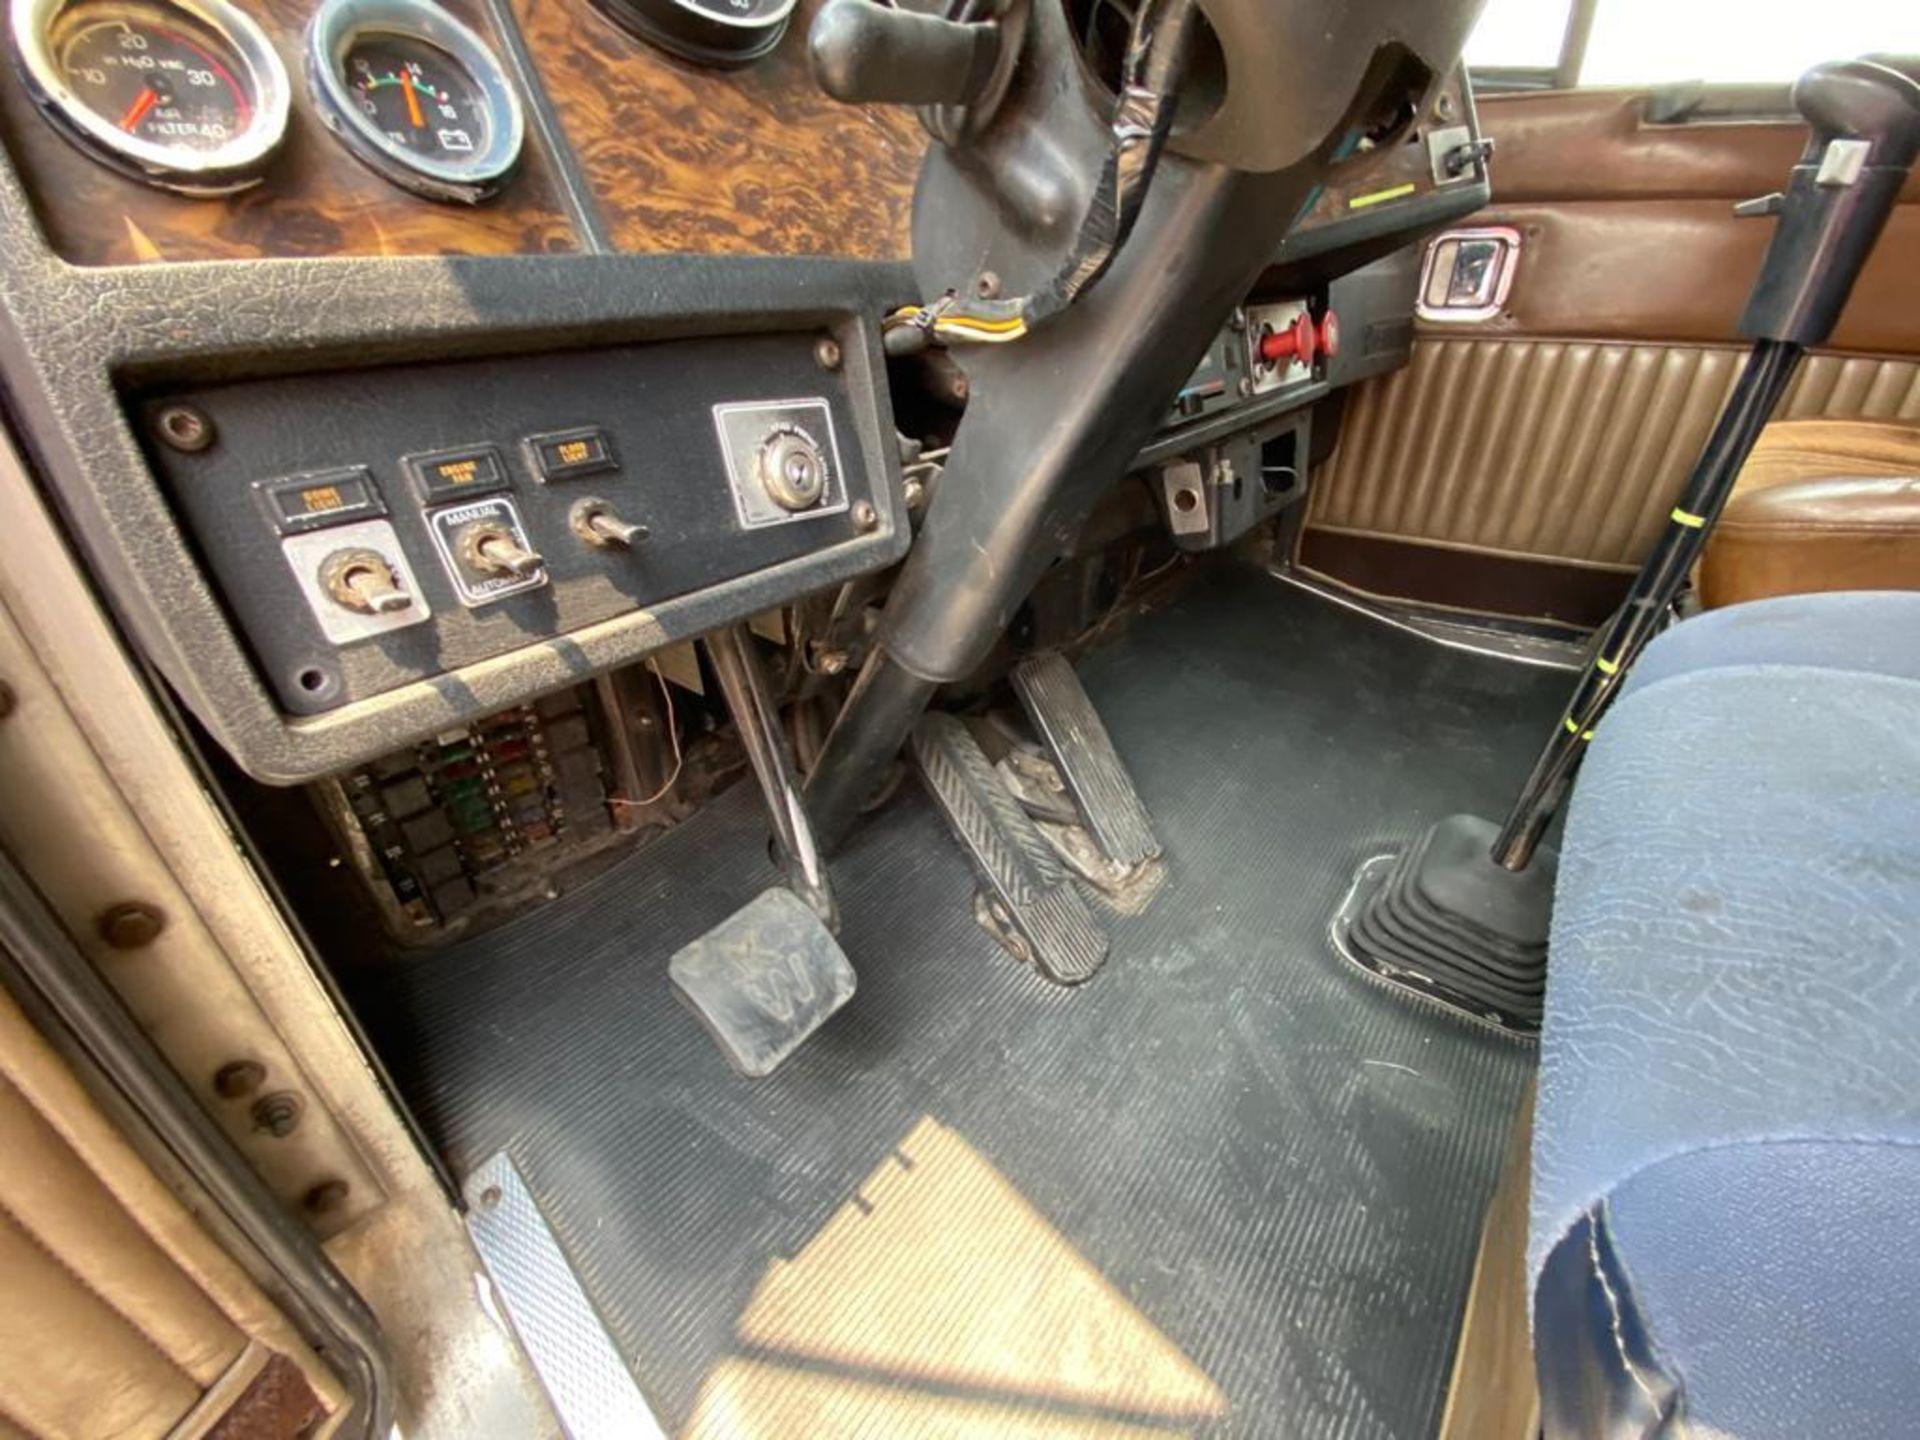 1999 Kenworth Sleeper truck tractor, standard transmission of 18 speeds - Image 43 of 70